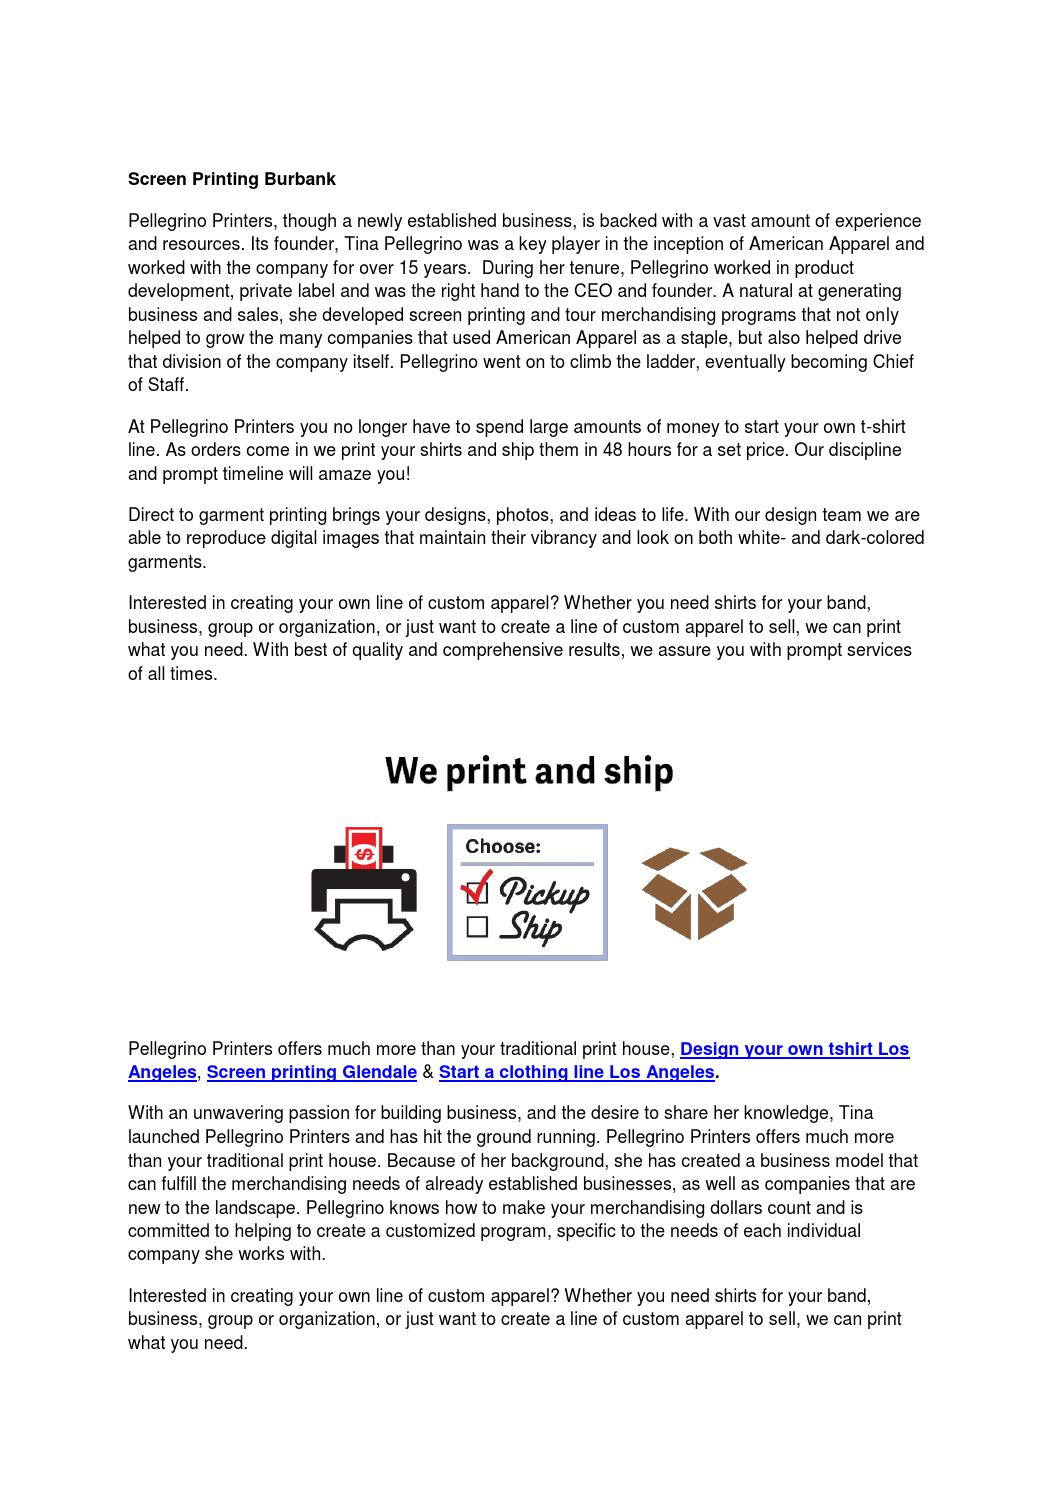 Screen Printing Burbank By Screenprinting Issuu